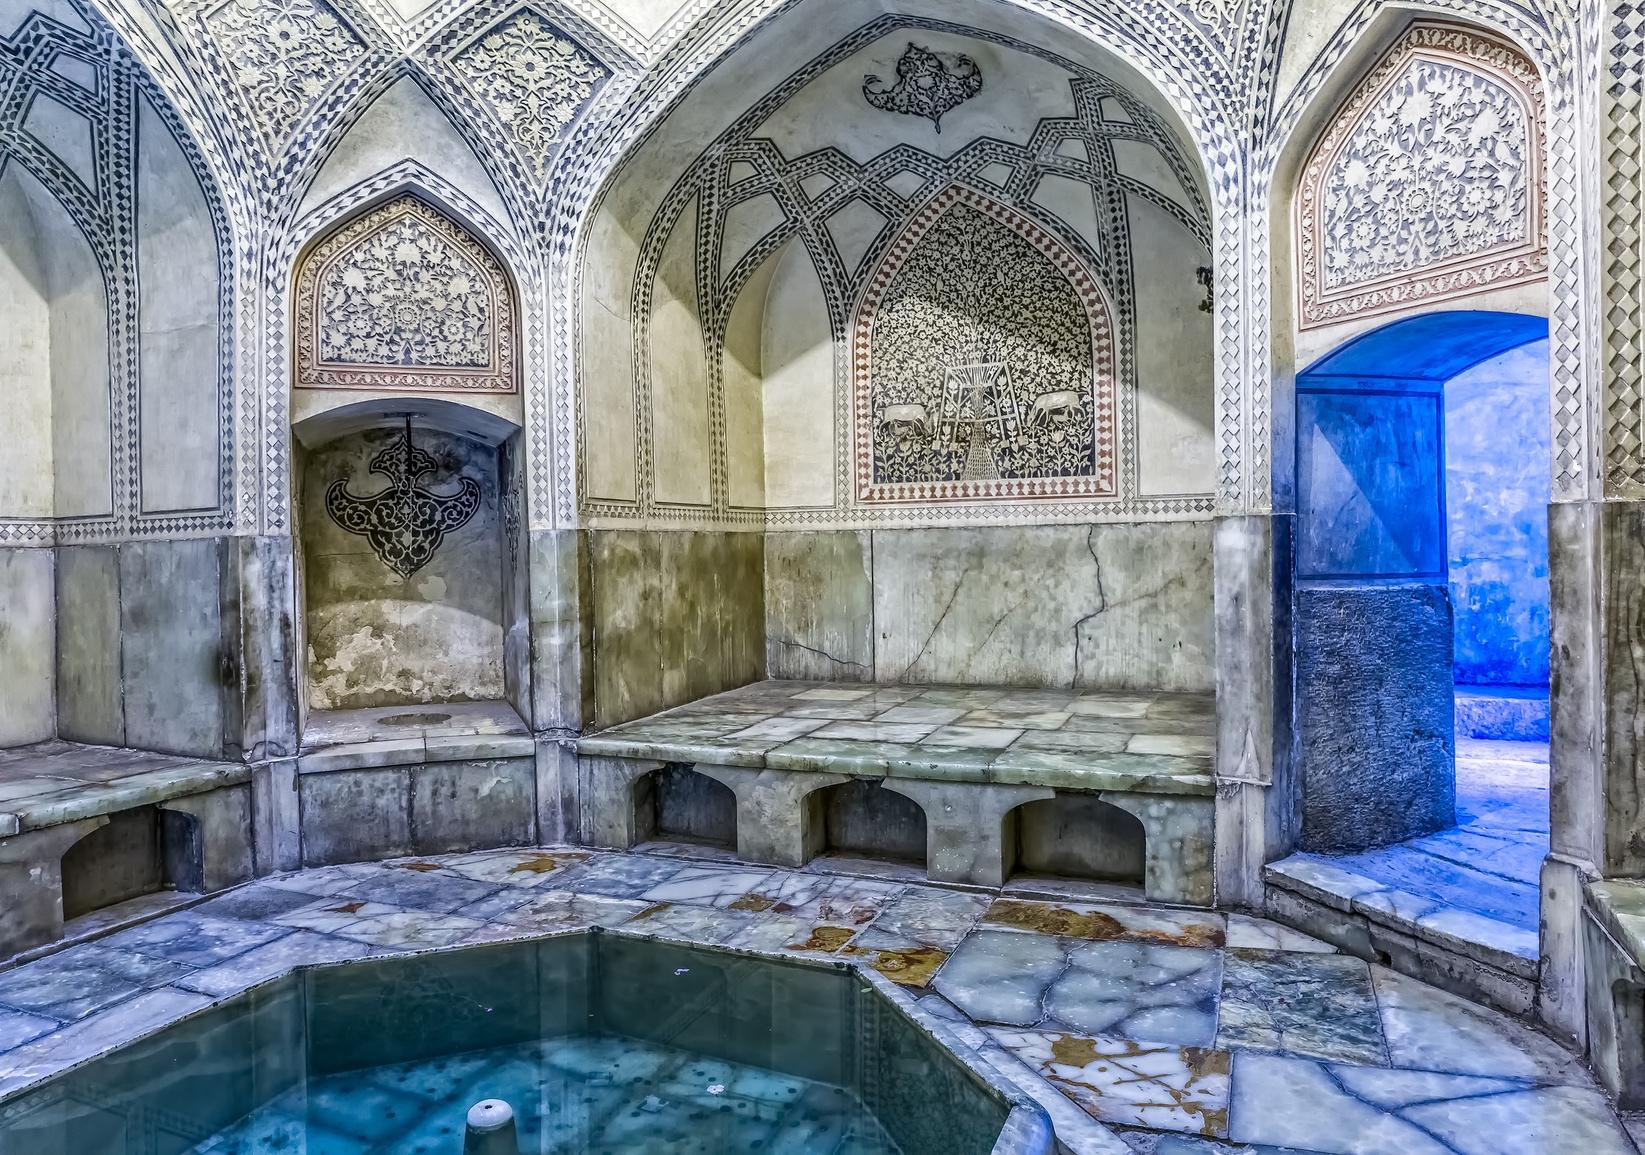 Bath inside the Arg of Karim Khan in the centre of the Shiraz city.